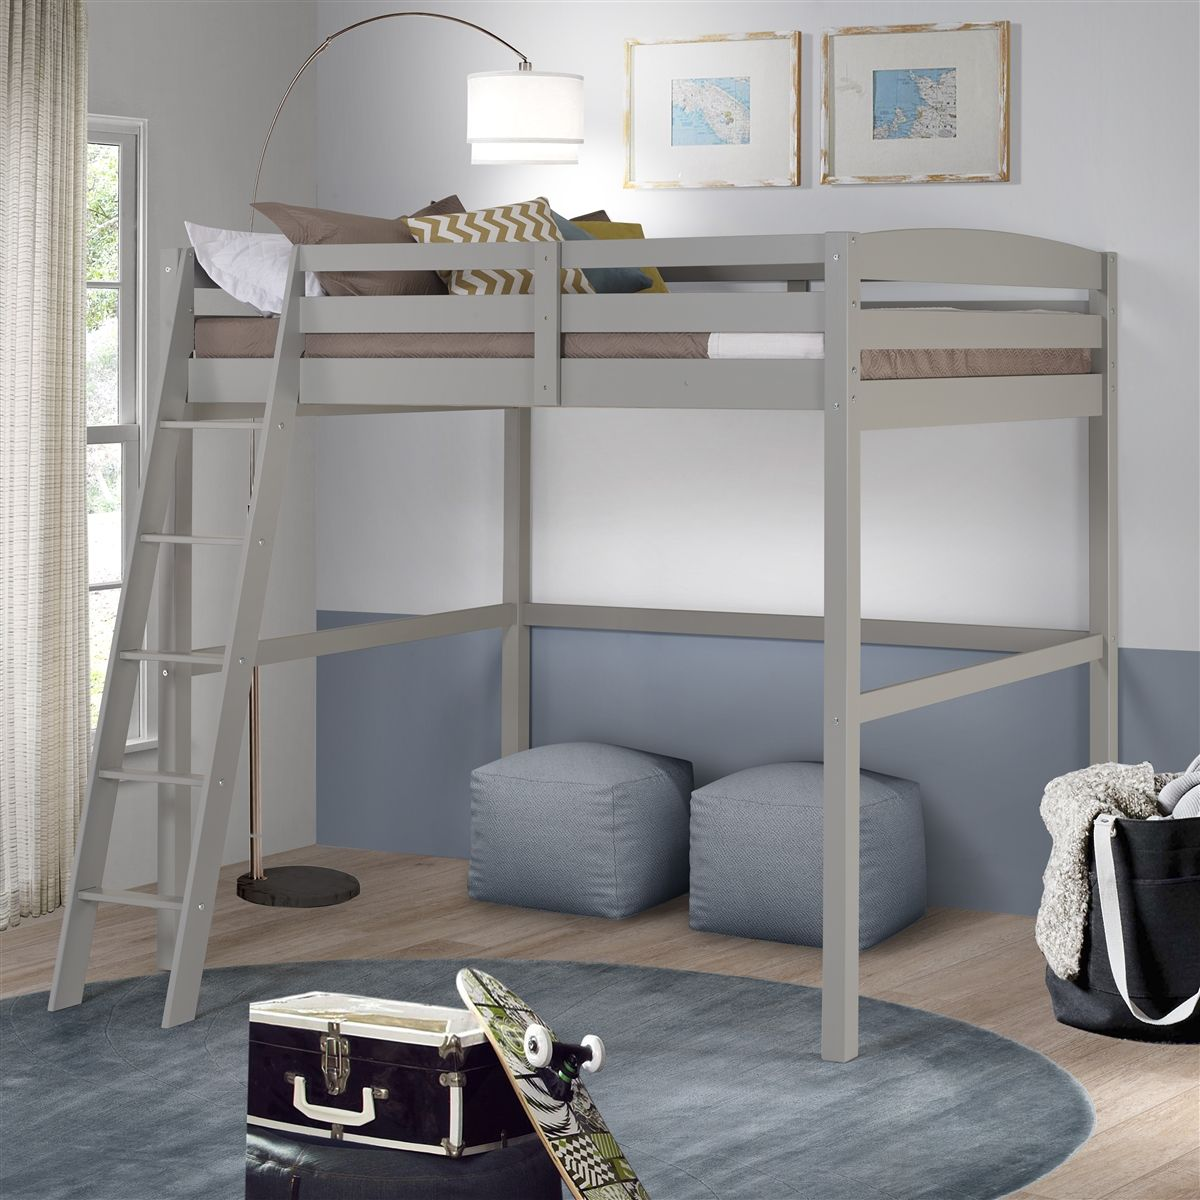 Pin on loft beds